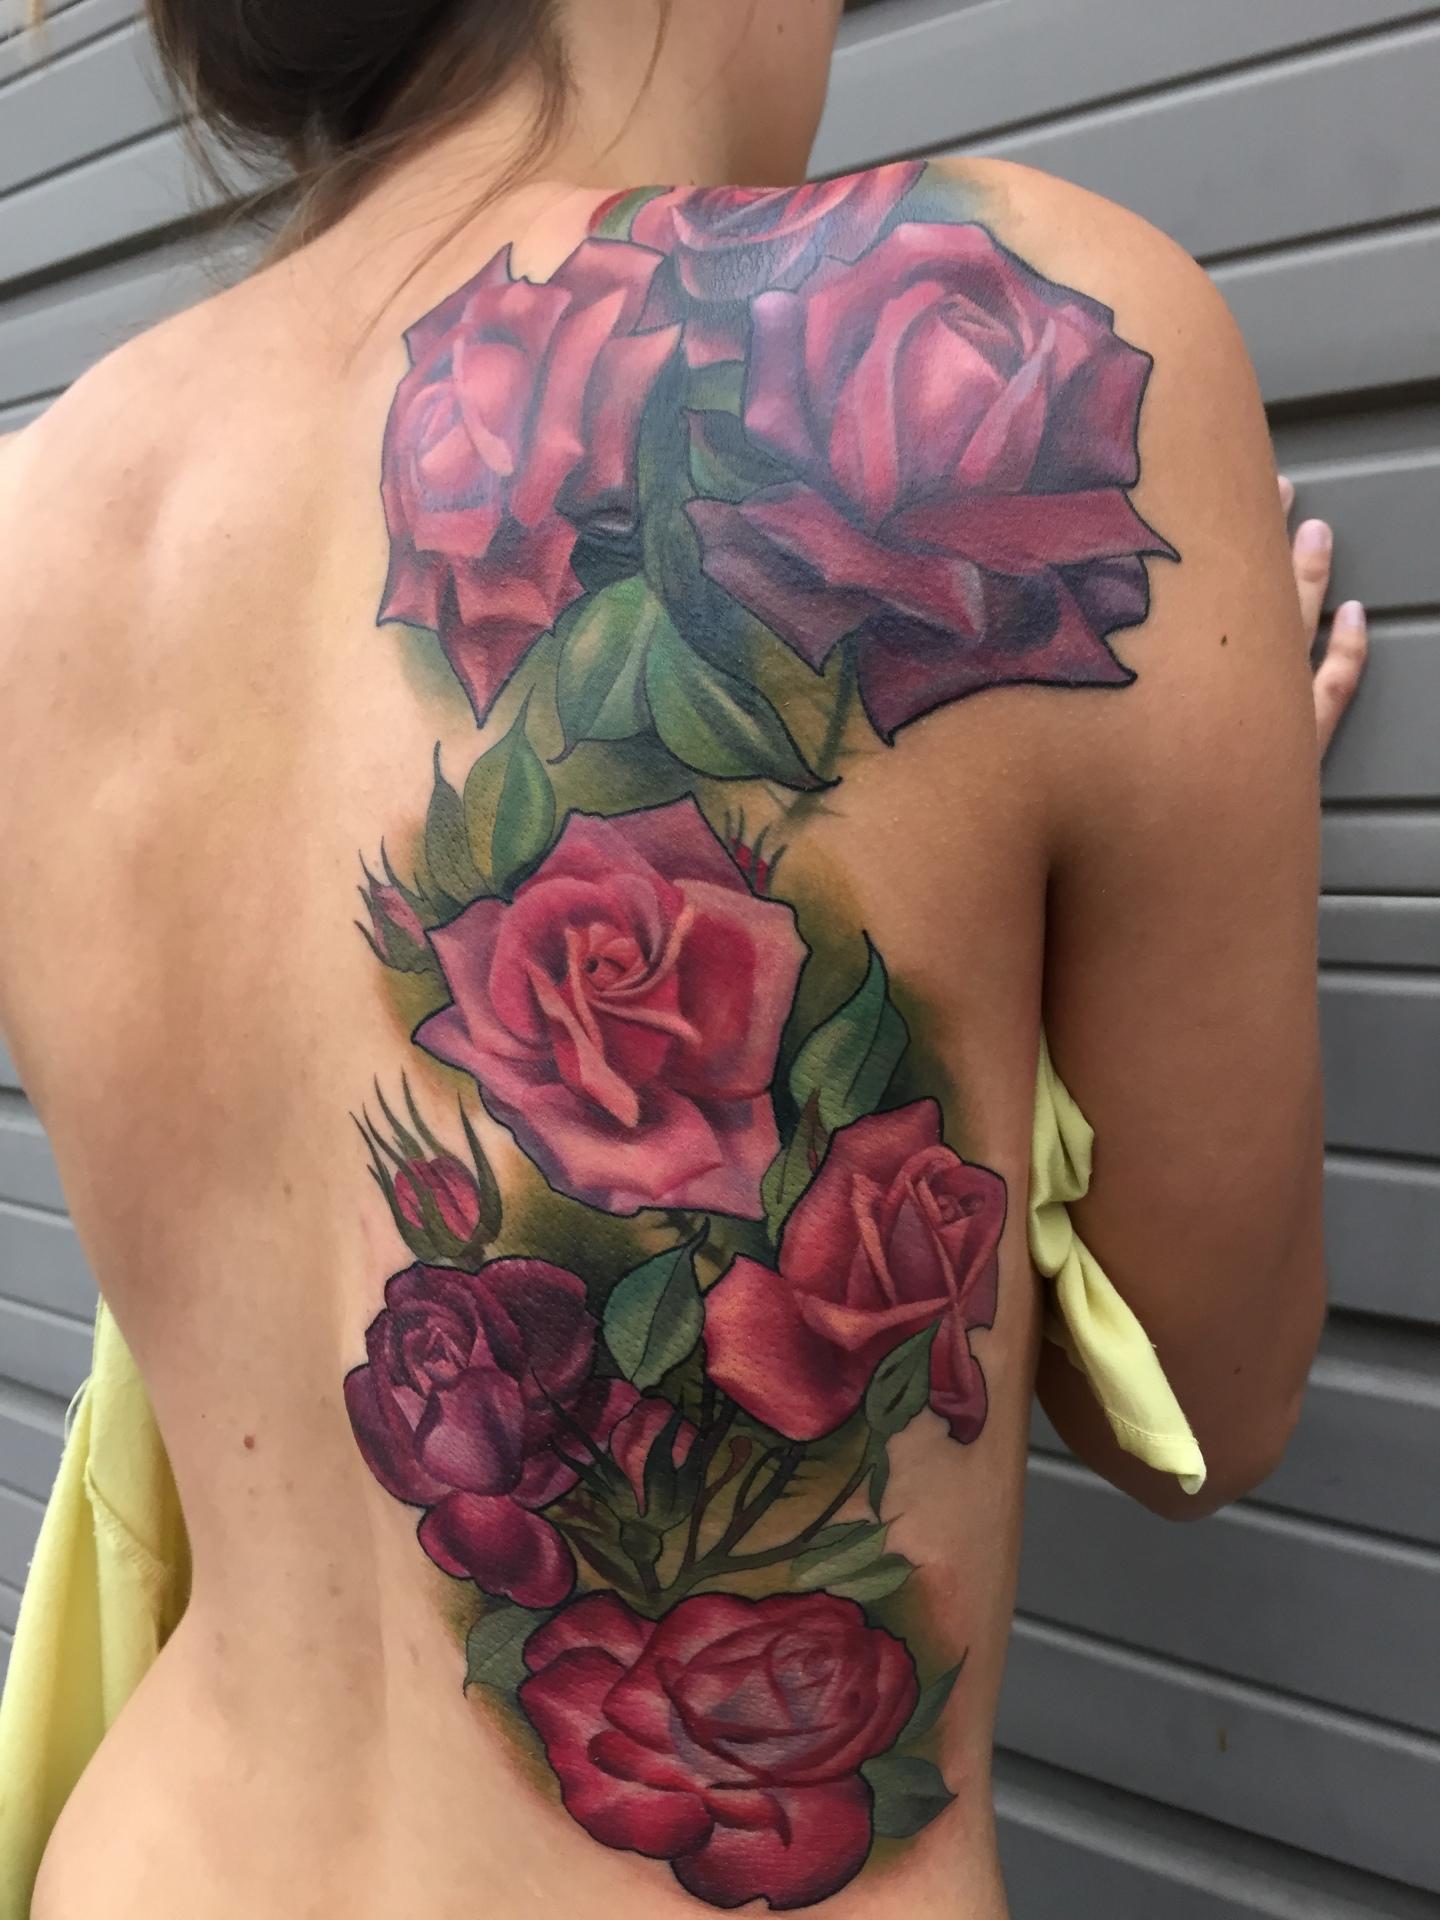 Rose, roses, tattoo, art, realism rose, pretty, beautiful, floral, floral tattoo, orange county tattoo, nakota garza